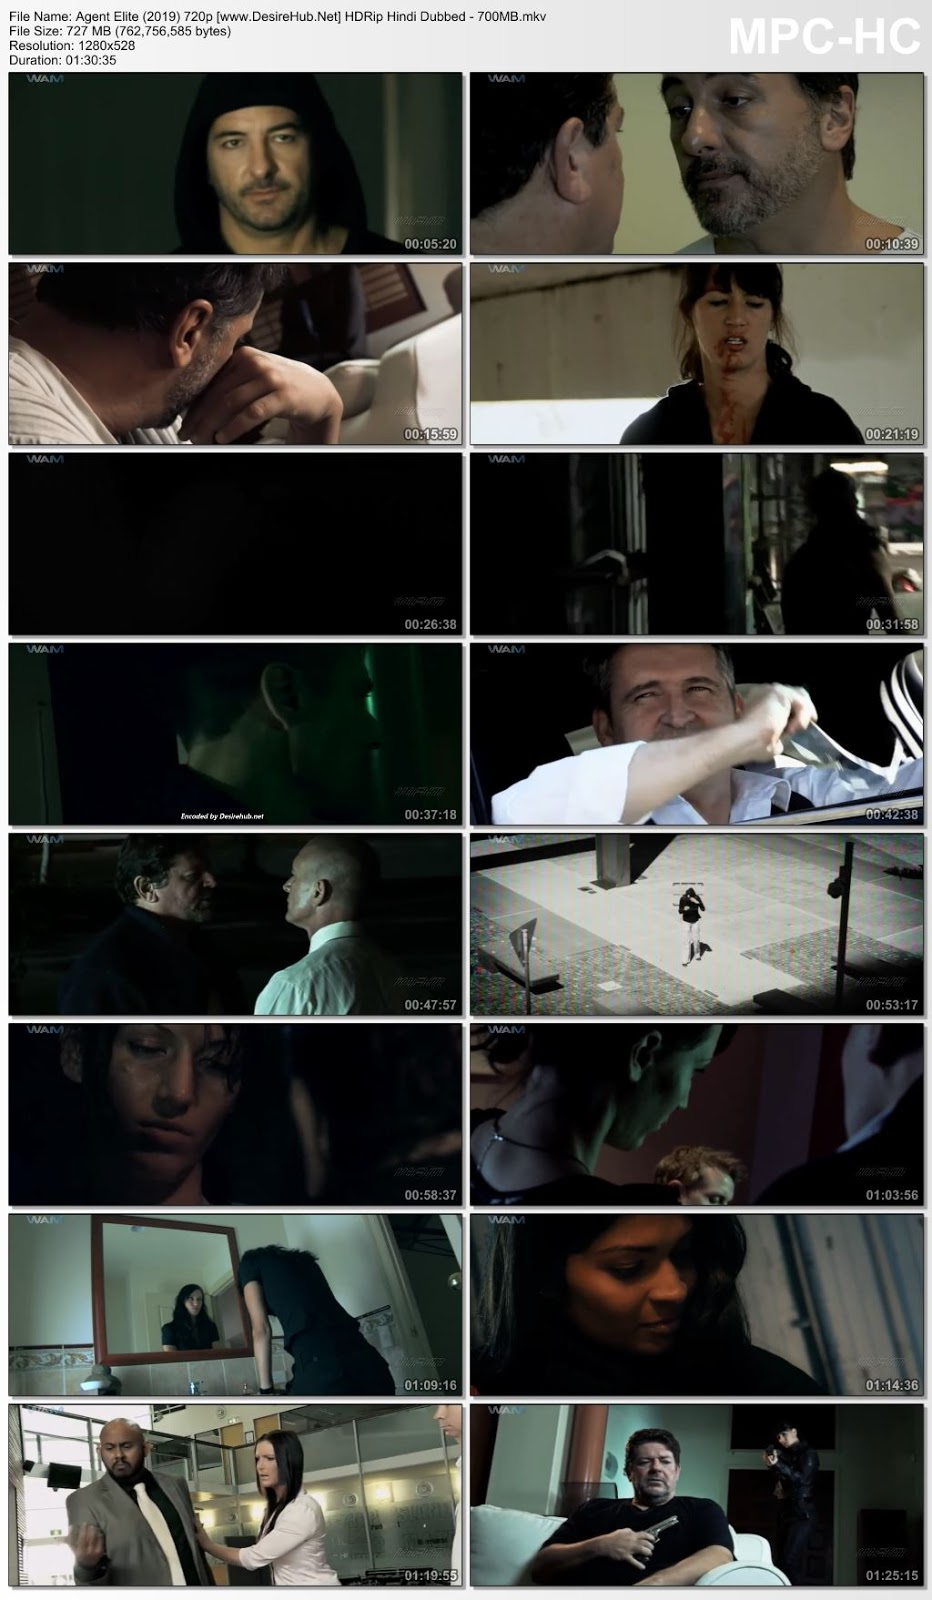 Agent Elite (2019) Hindi Dubbed 720p HDRip – 700MB Desirehub